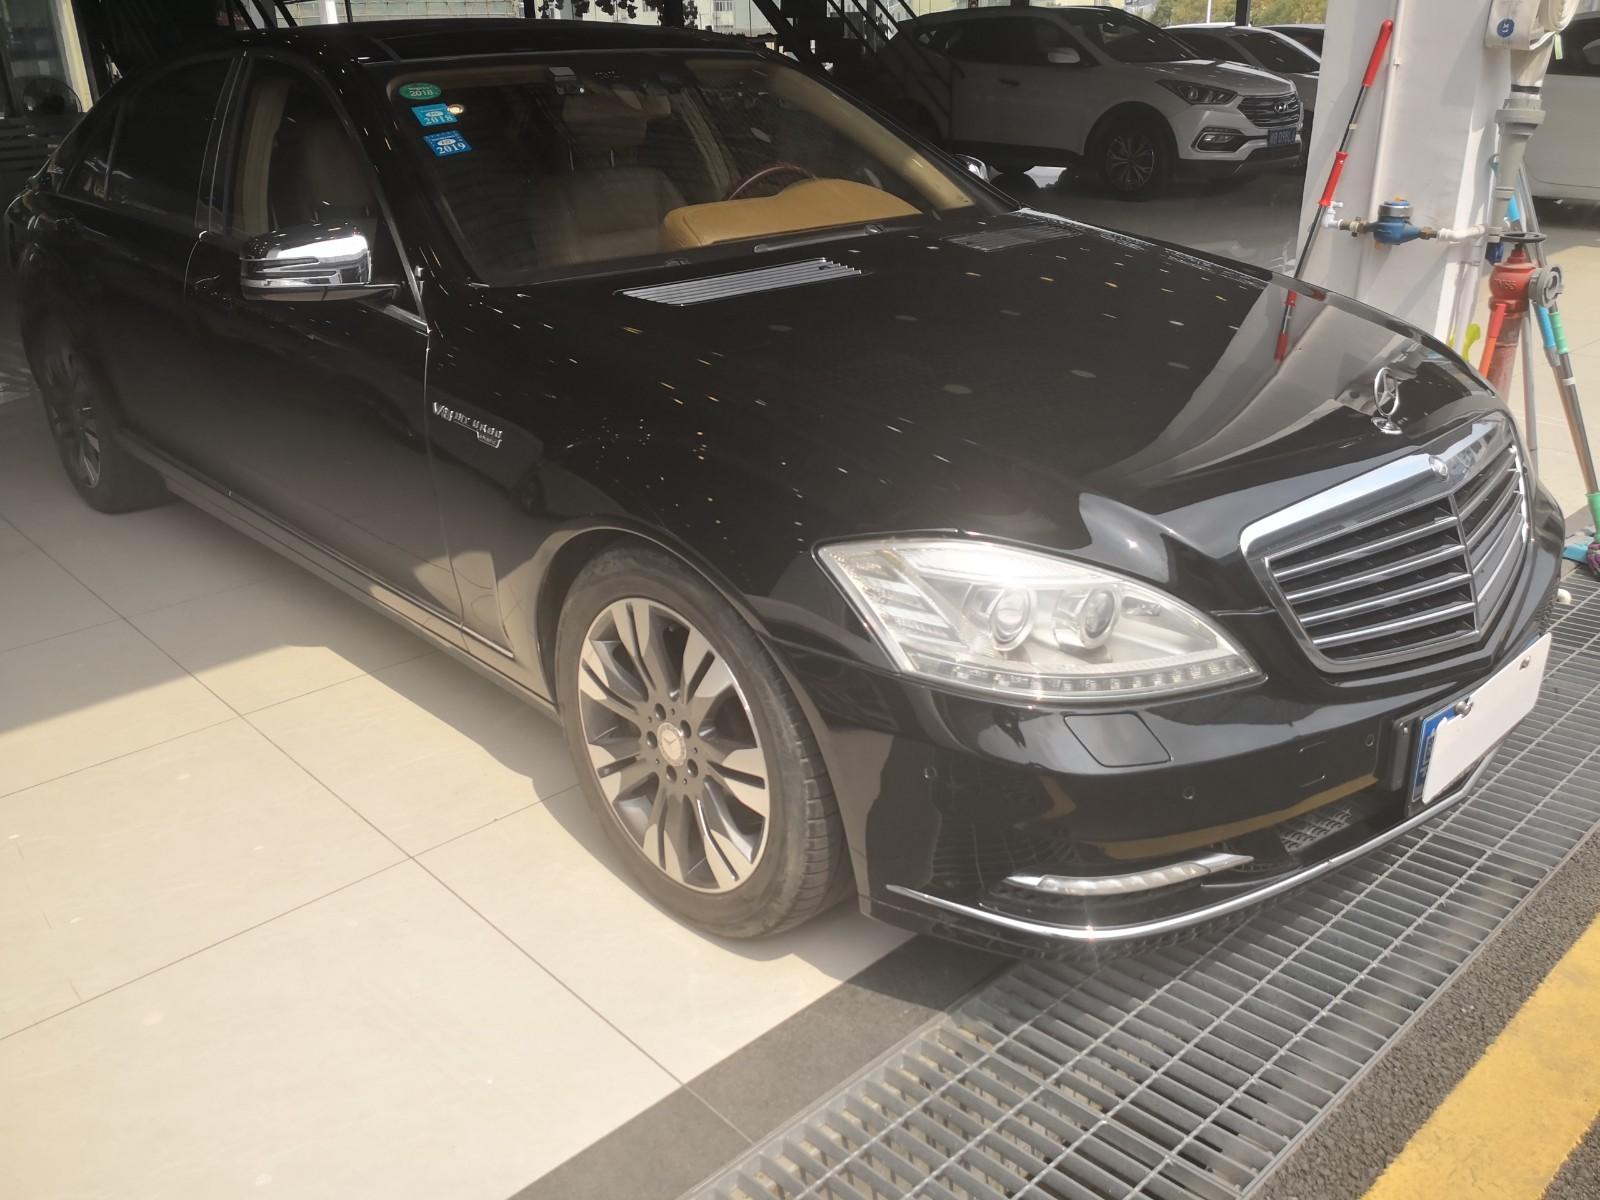 奔驰S级 2010款 S 500 L 4MATIC